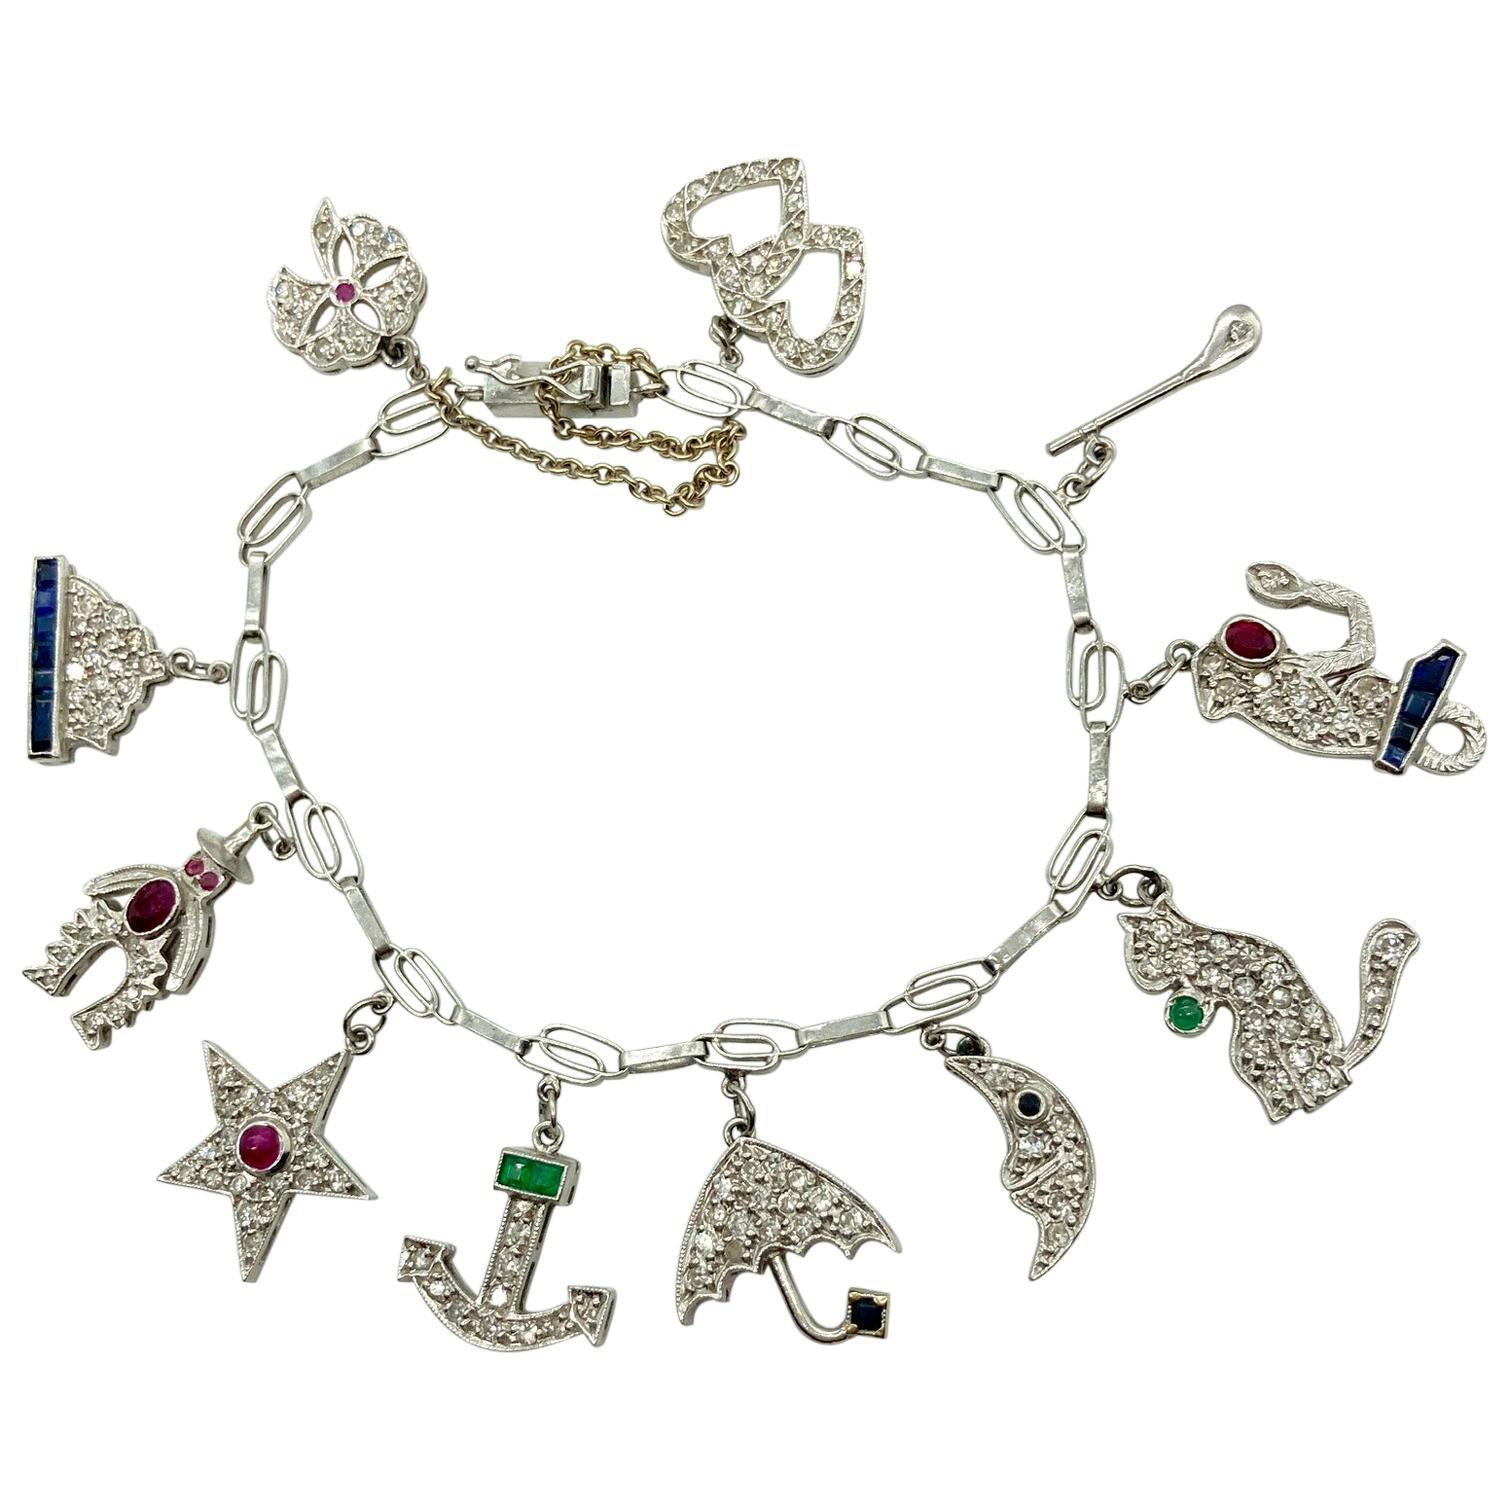 Art Deco Diamond and Gemstone White Gold Charm Bracelet